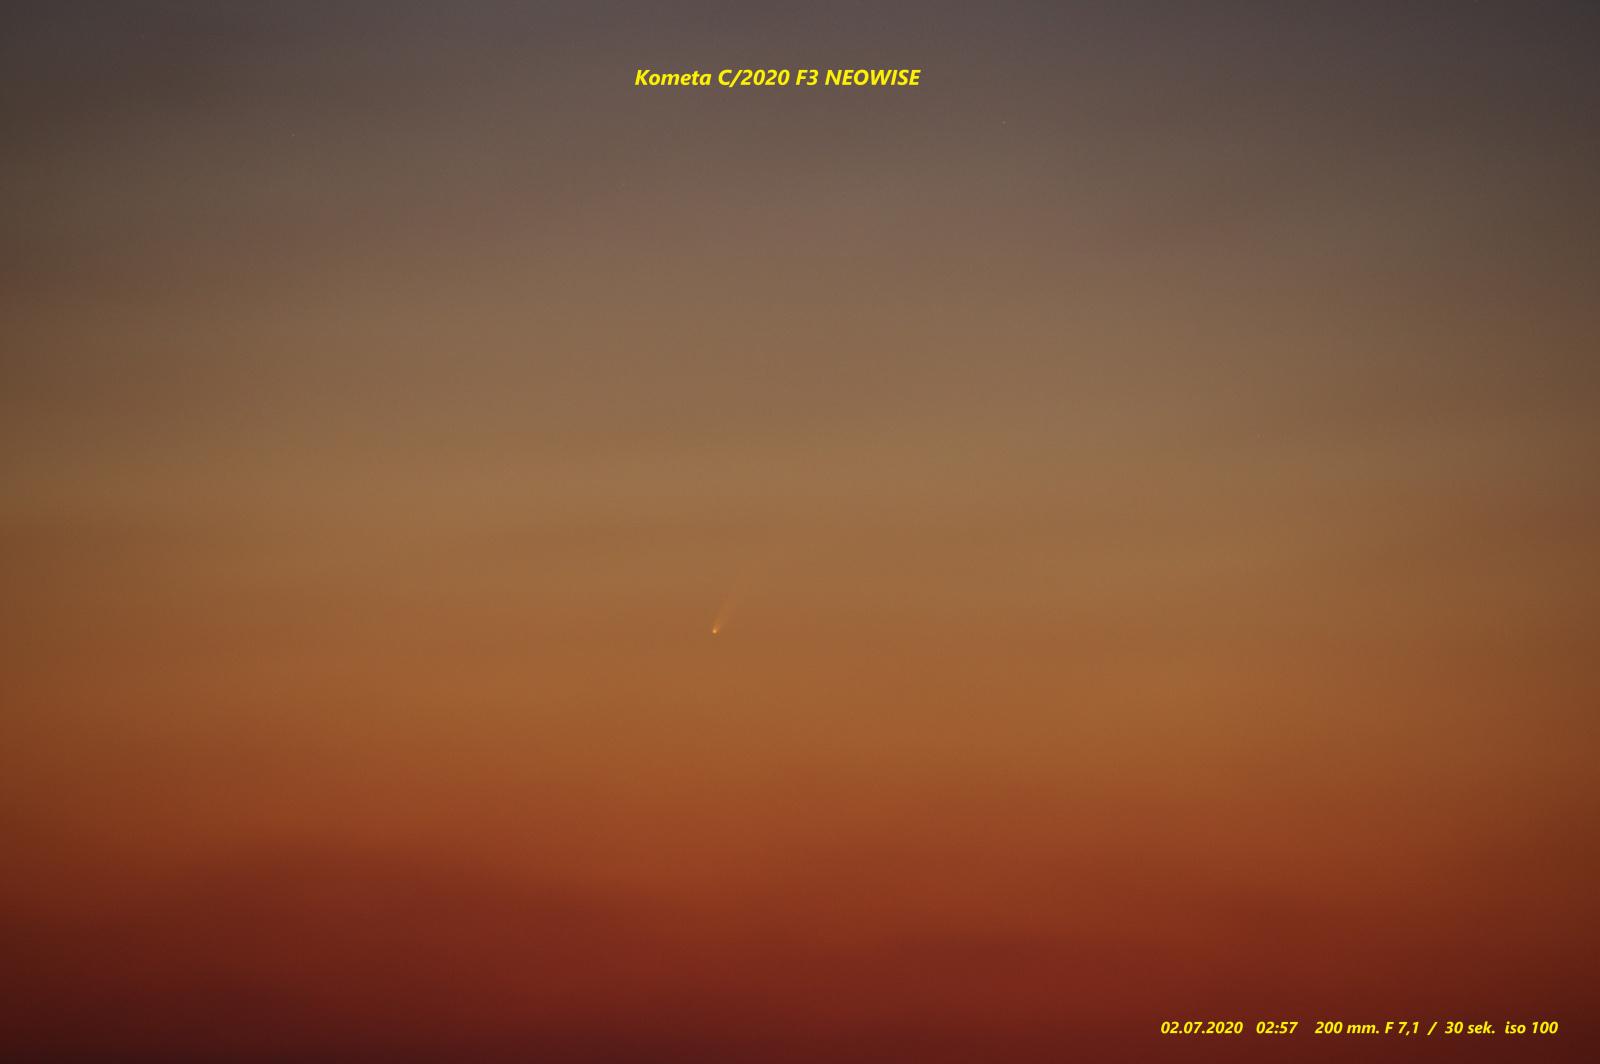 Kometa_C_2020_F3_NEOWISE___200_mm..jpg